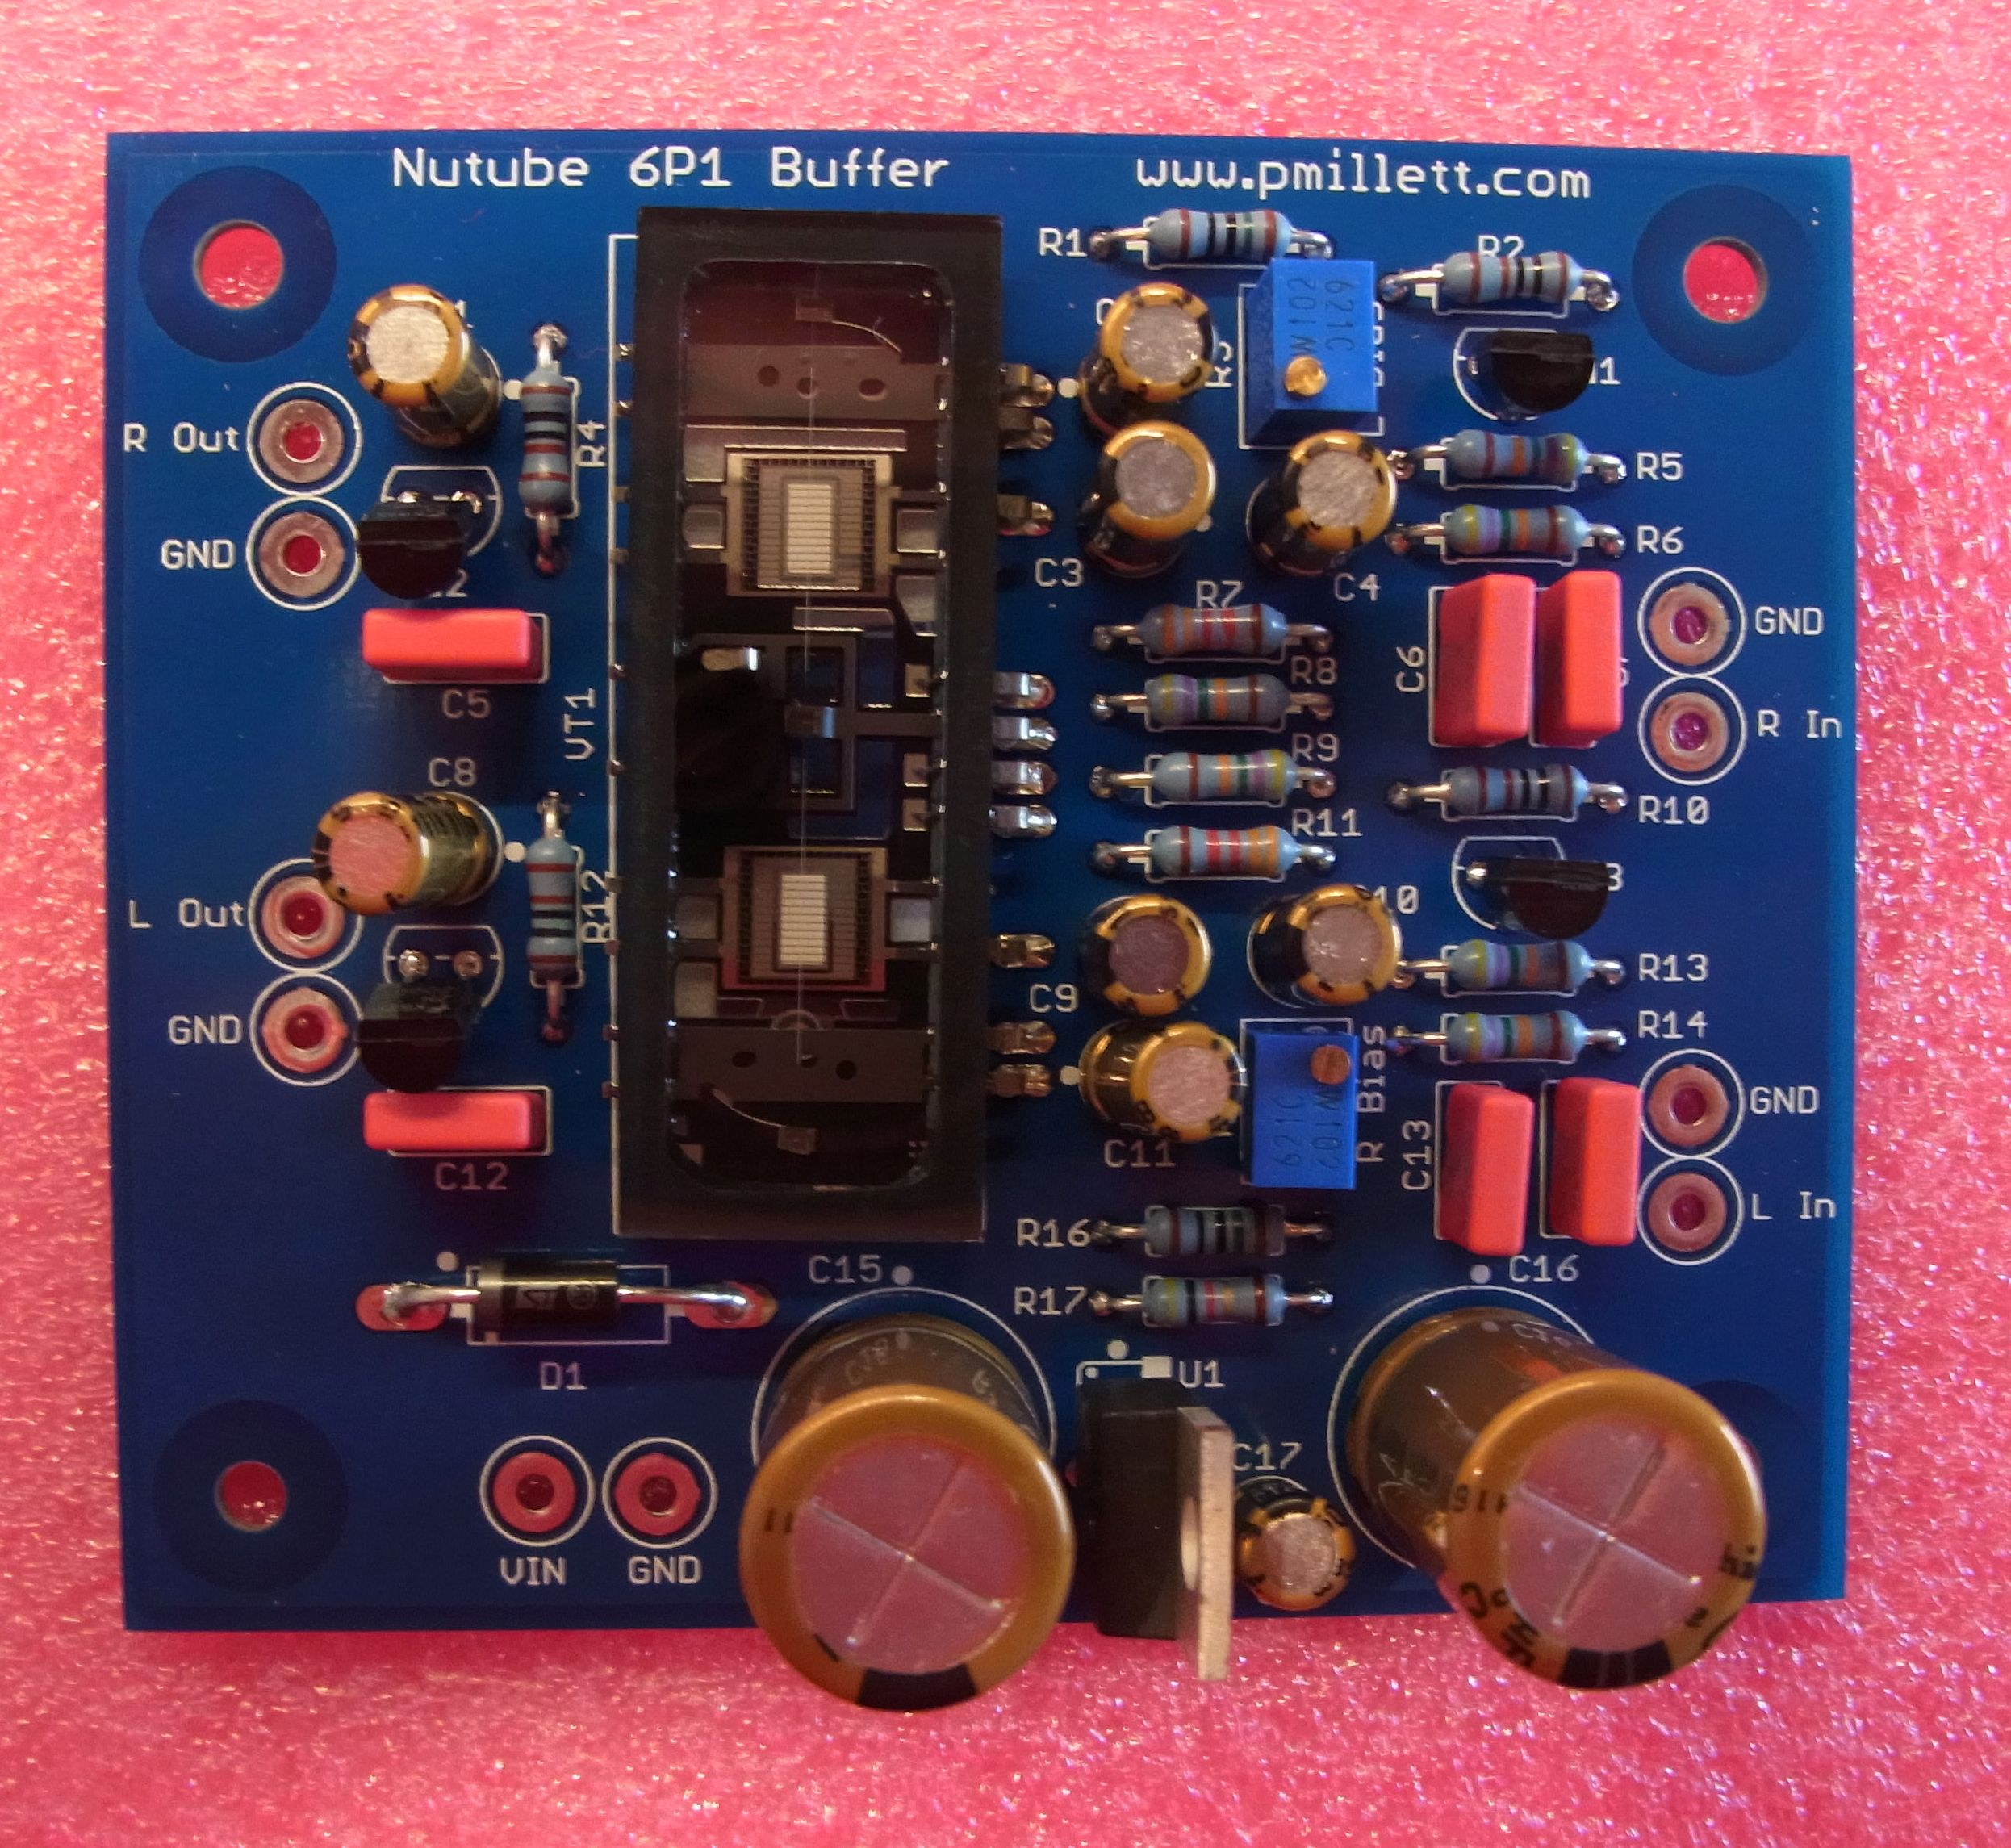 Nutube 6P1 Buffer PCB